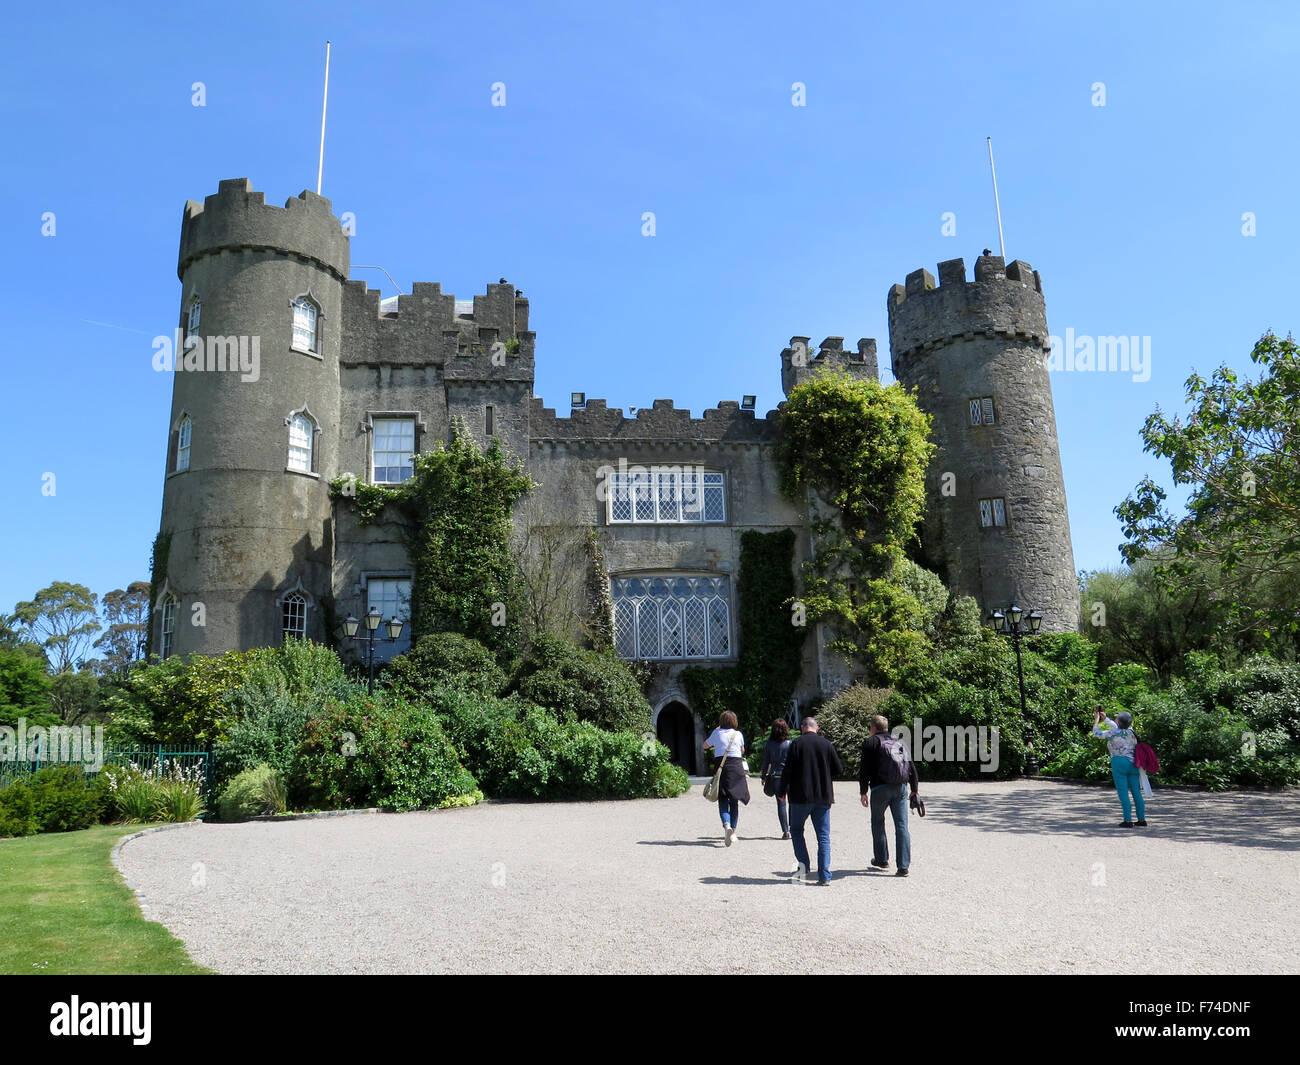 Malahide Castle, Malahide, Ireland - Stock Image